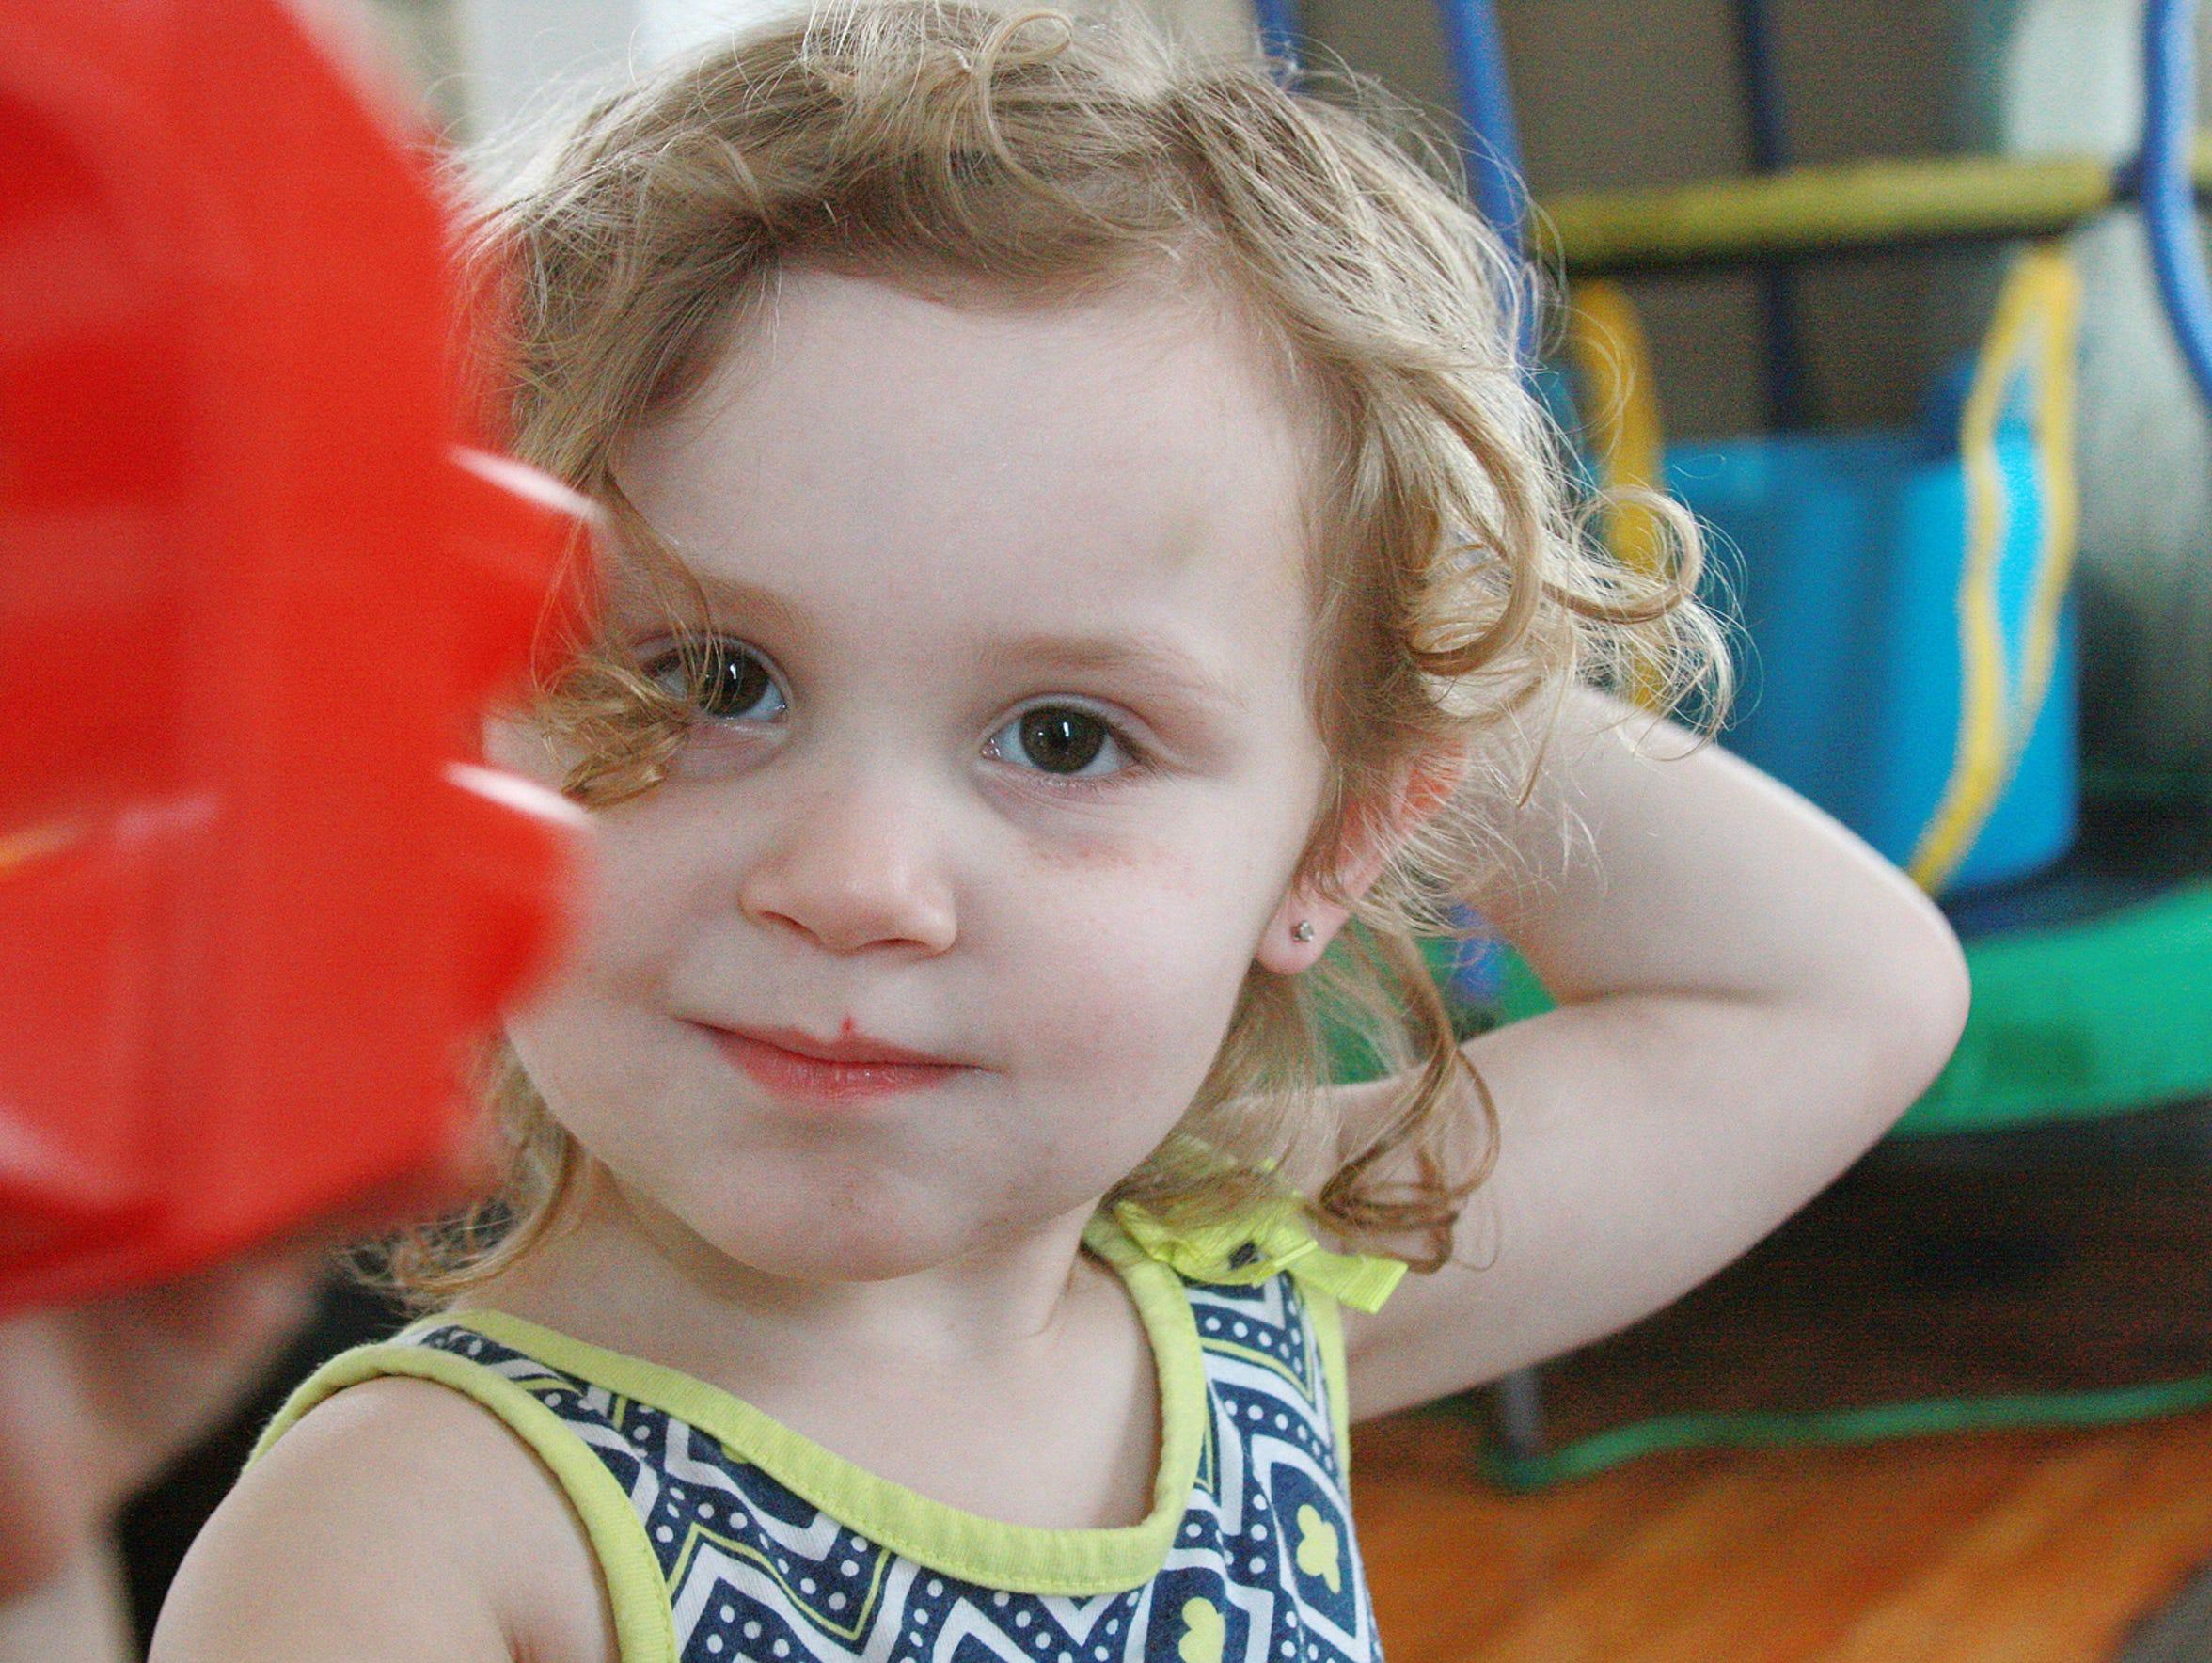 Last week, 2-year-old Alexsis Bryant was again tested